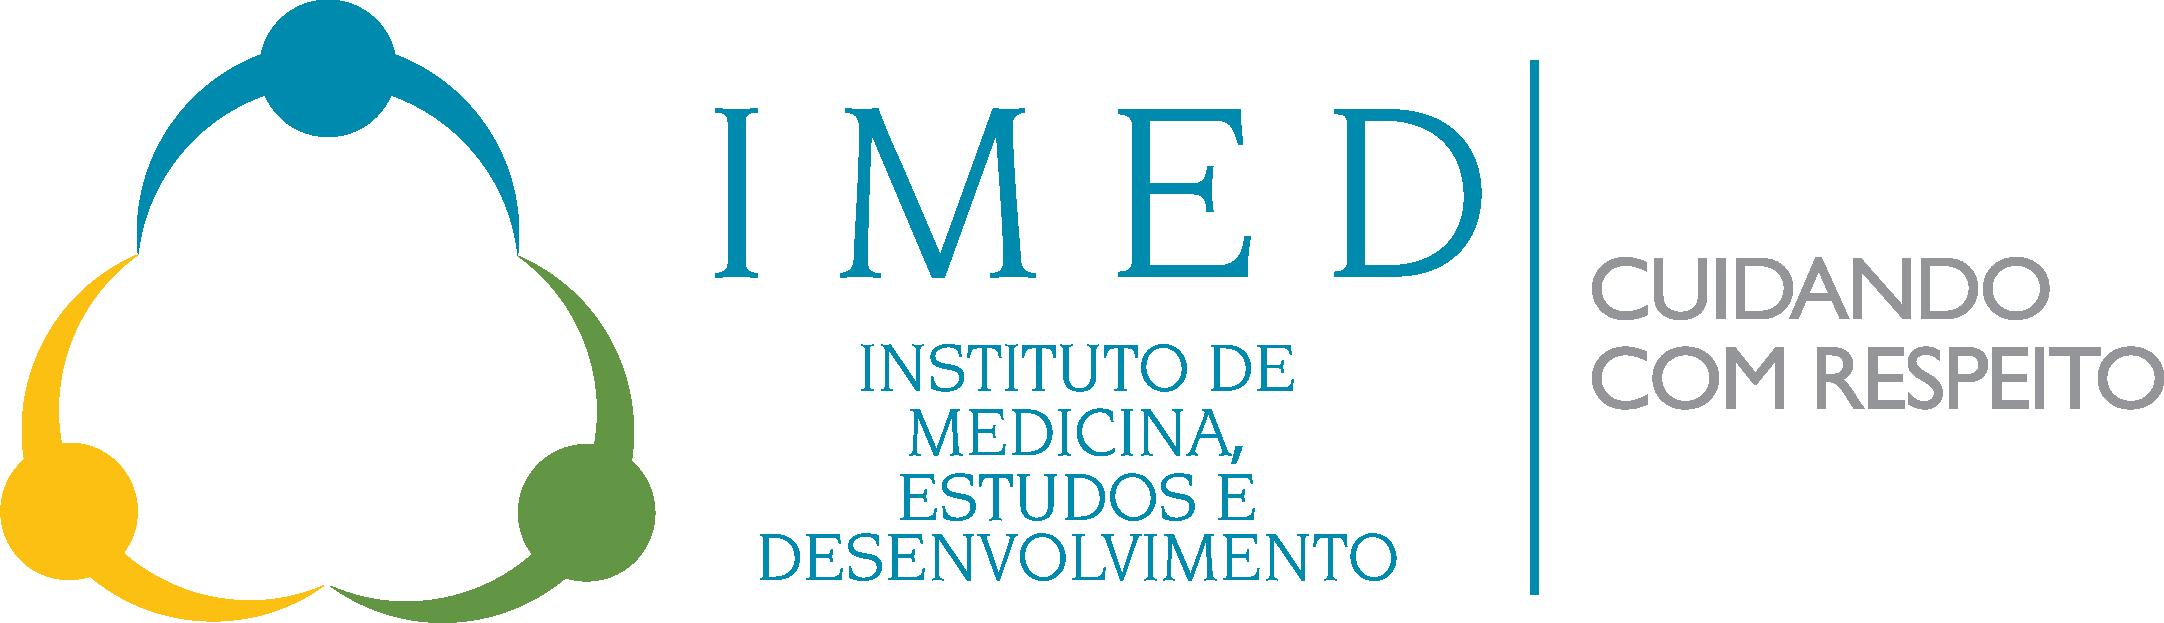 IMED – Instituto de Medicina, Estudos e Desenvolvimento.